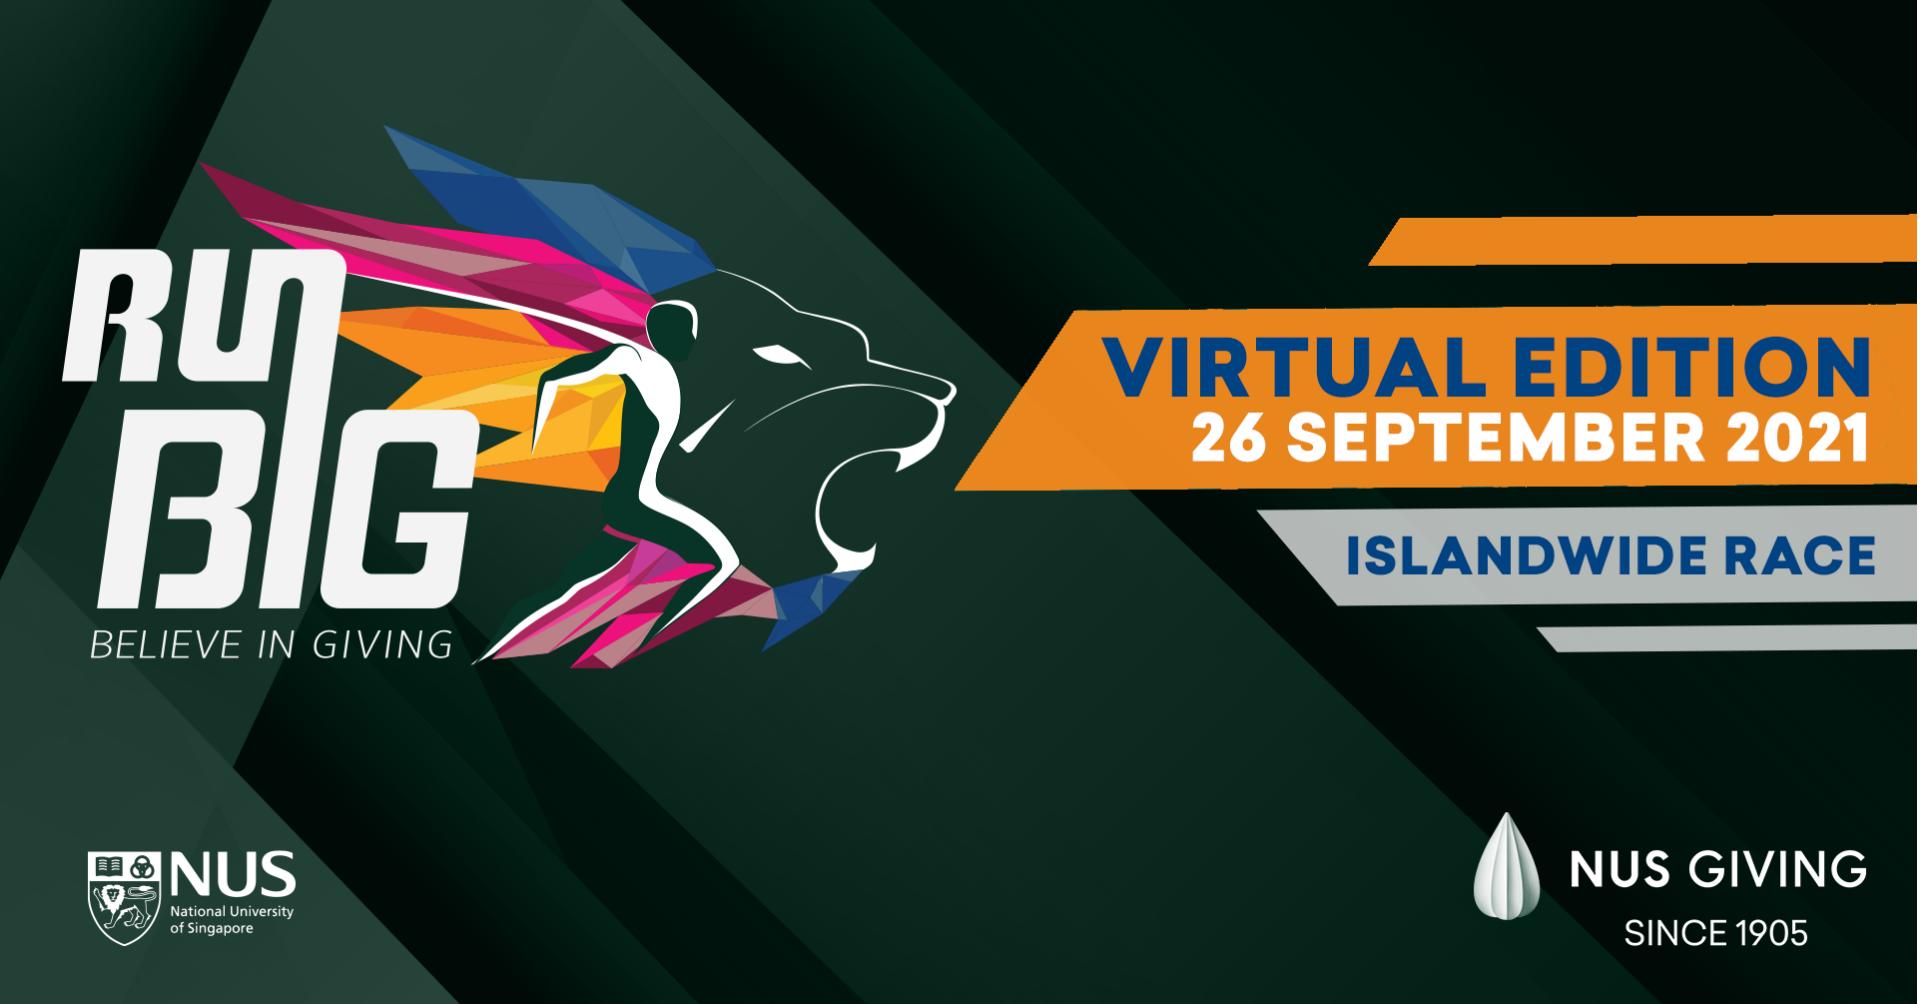 Logo of NUS Giving Run Big 2021 – Virtual Edition